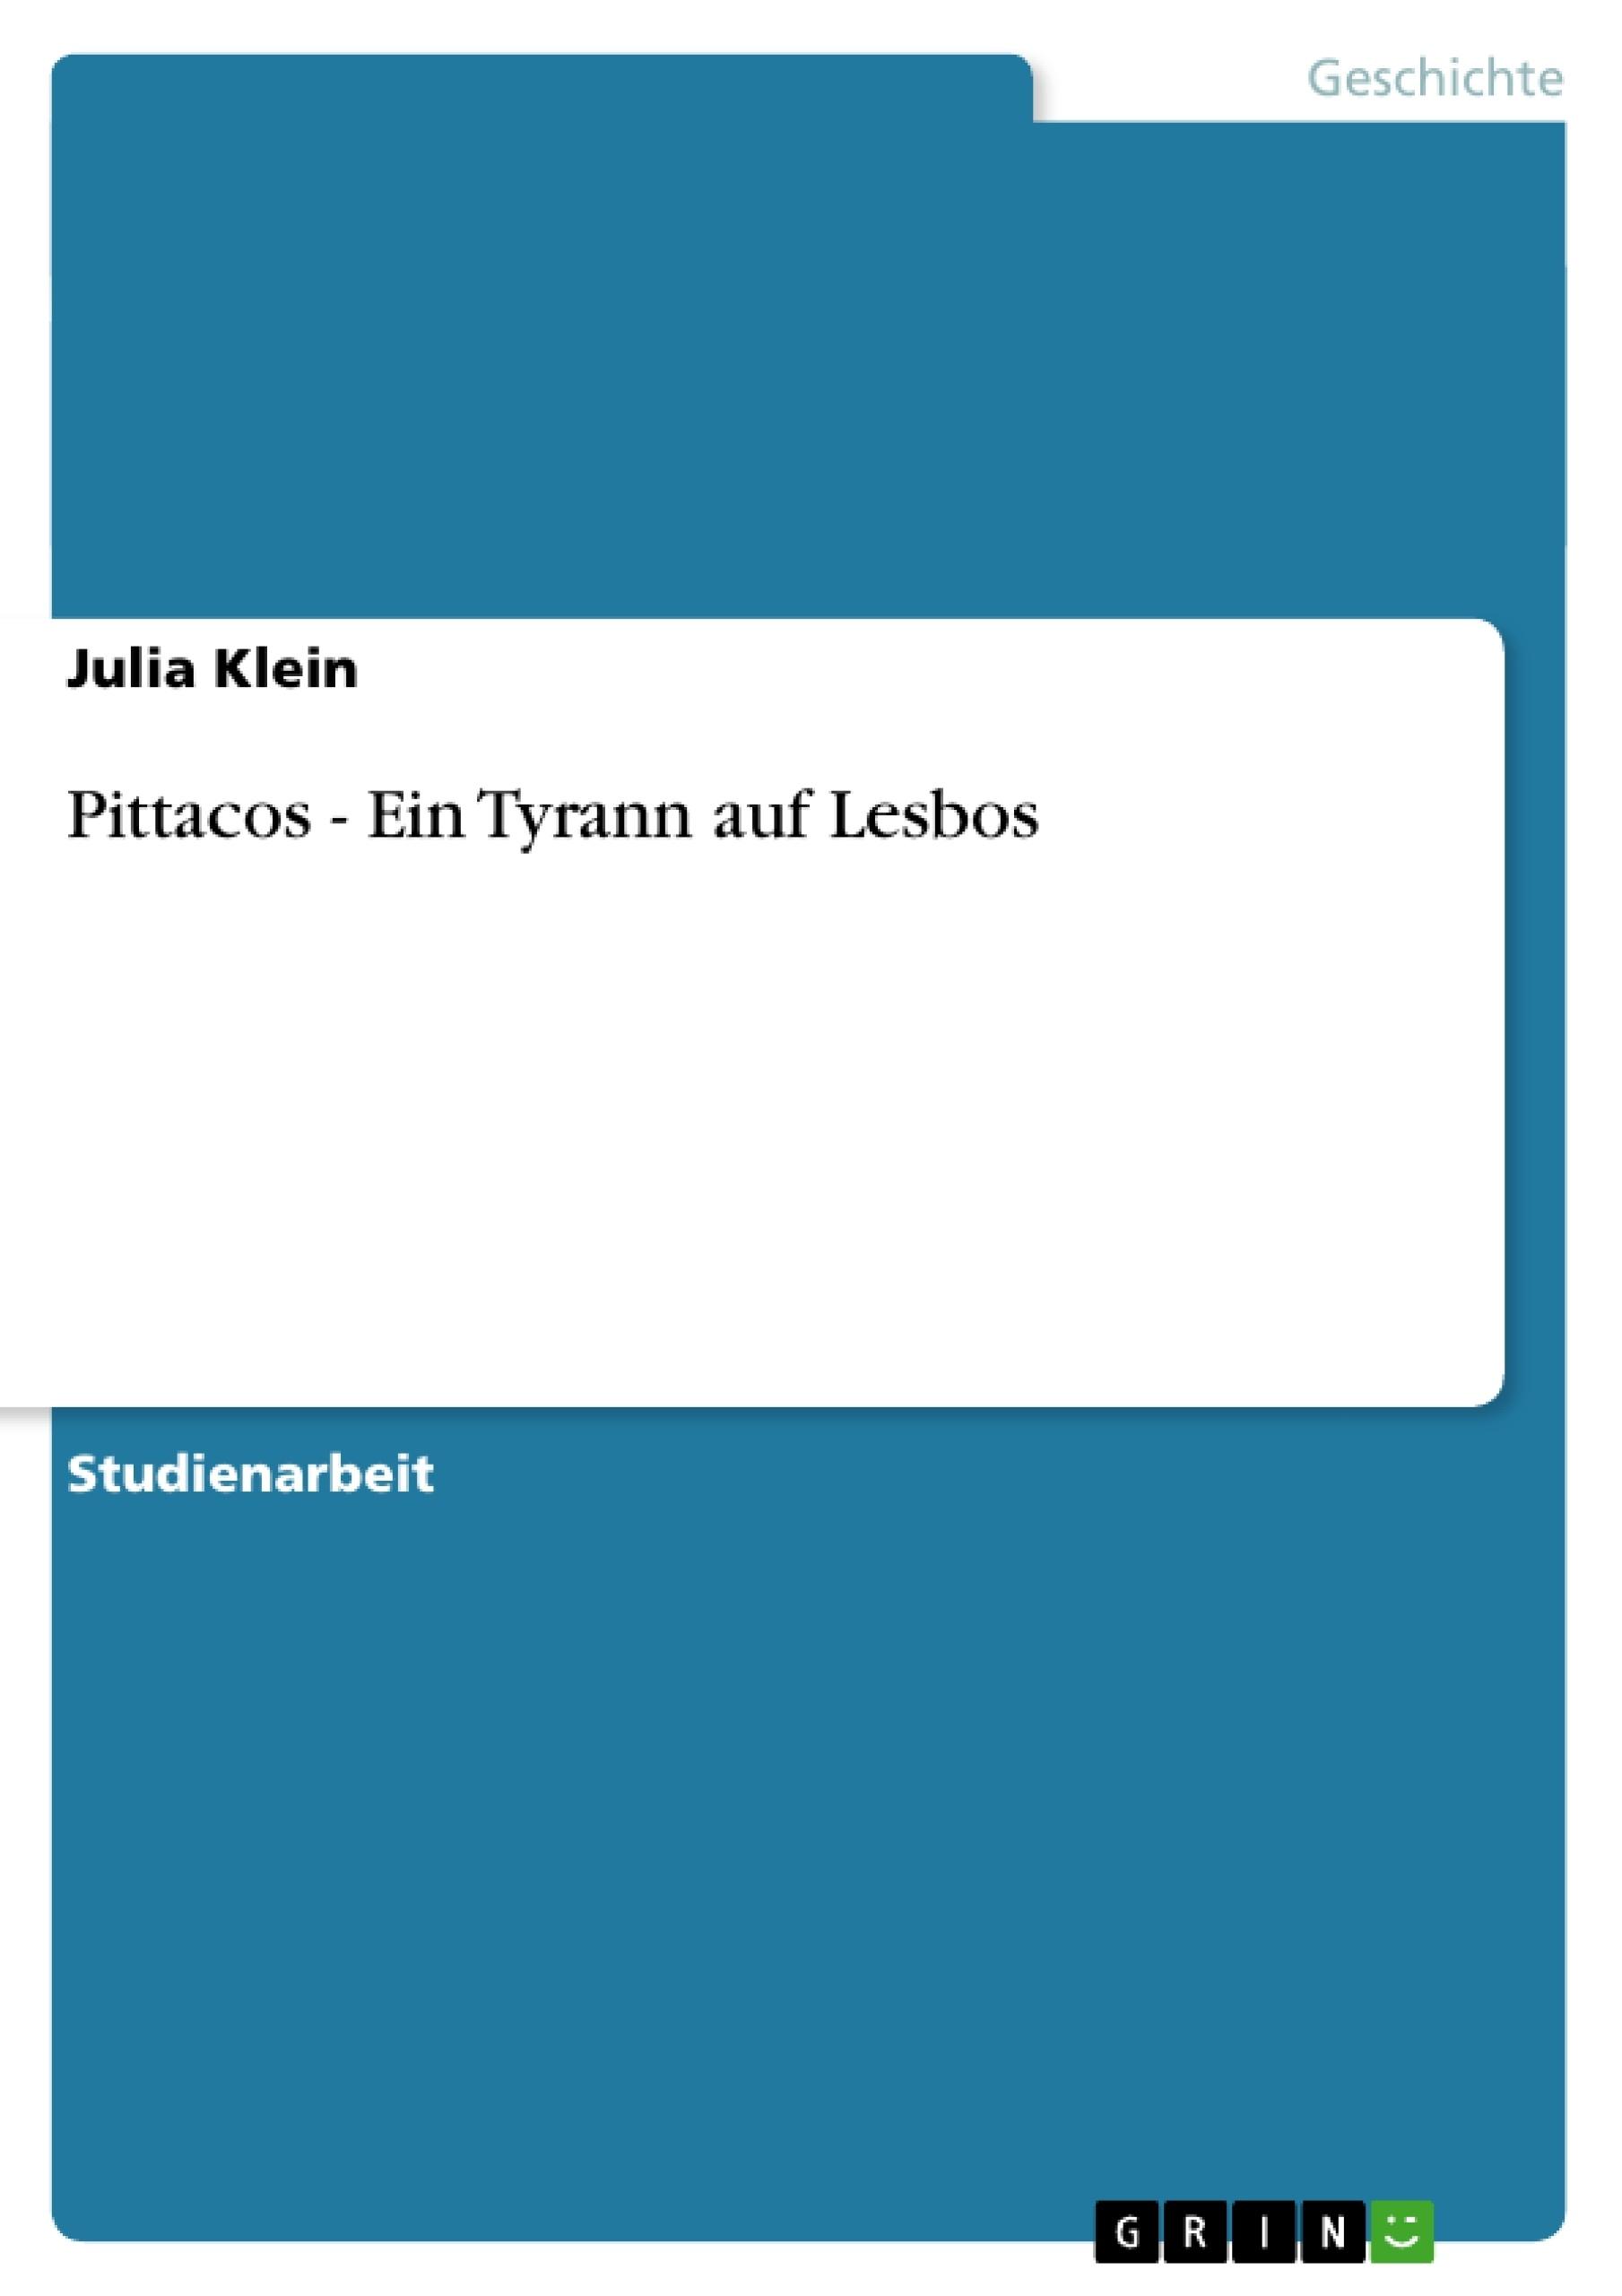 Titel: Pittacos - Ein Tyrann auf Lesbos